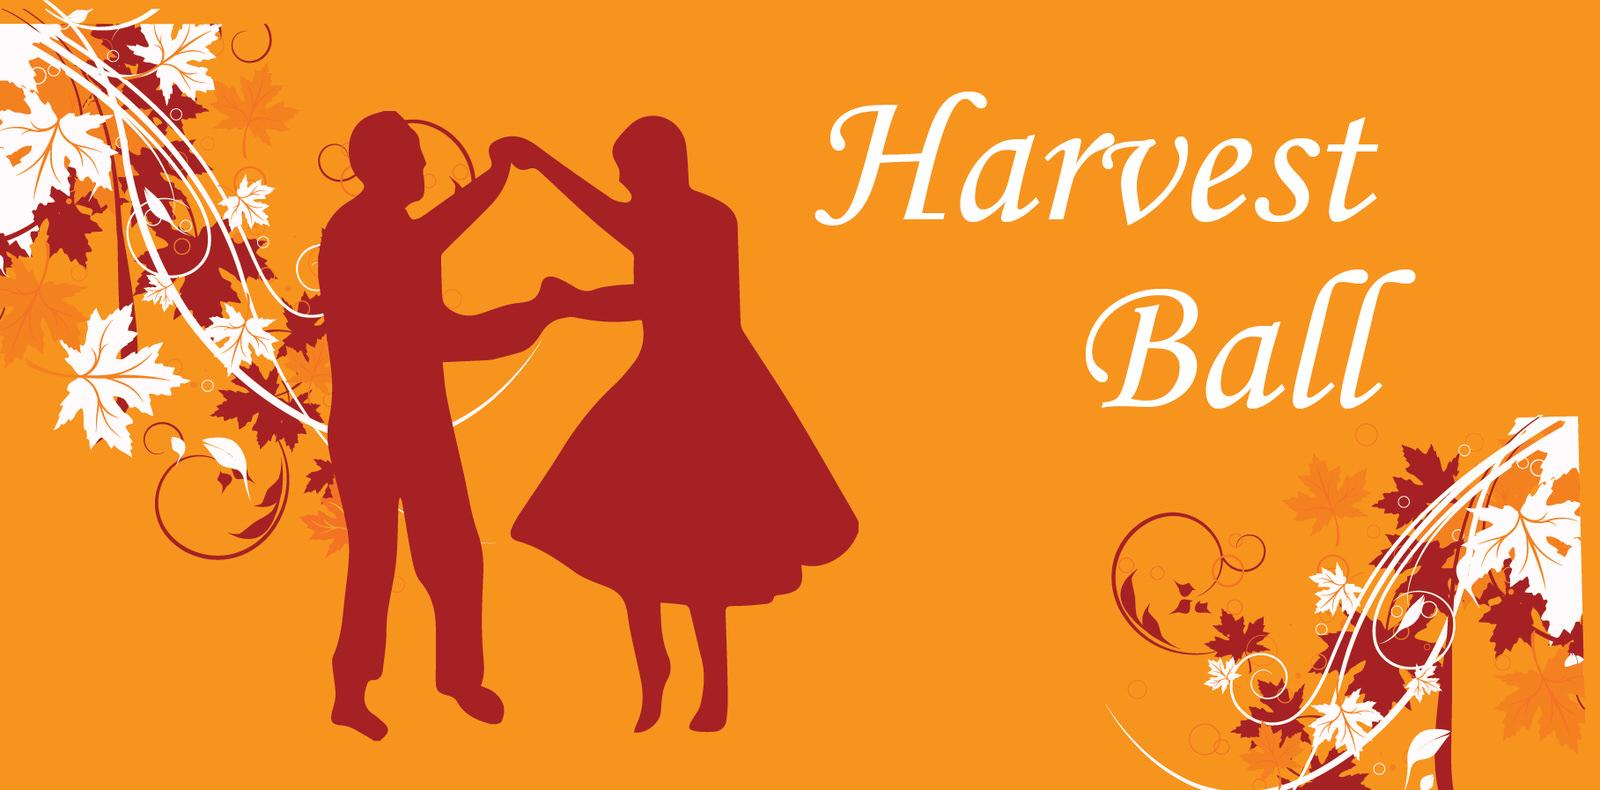 harvest-ball-image-04